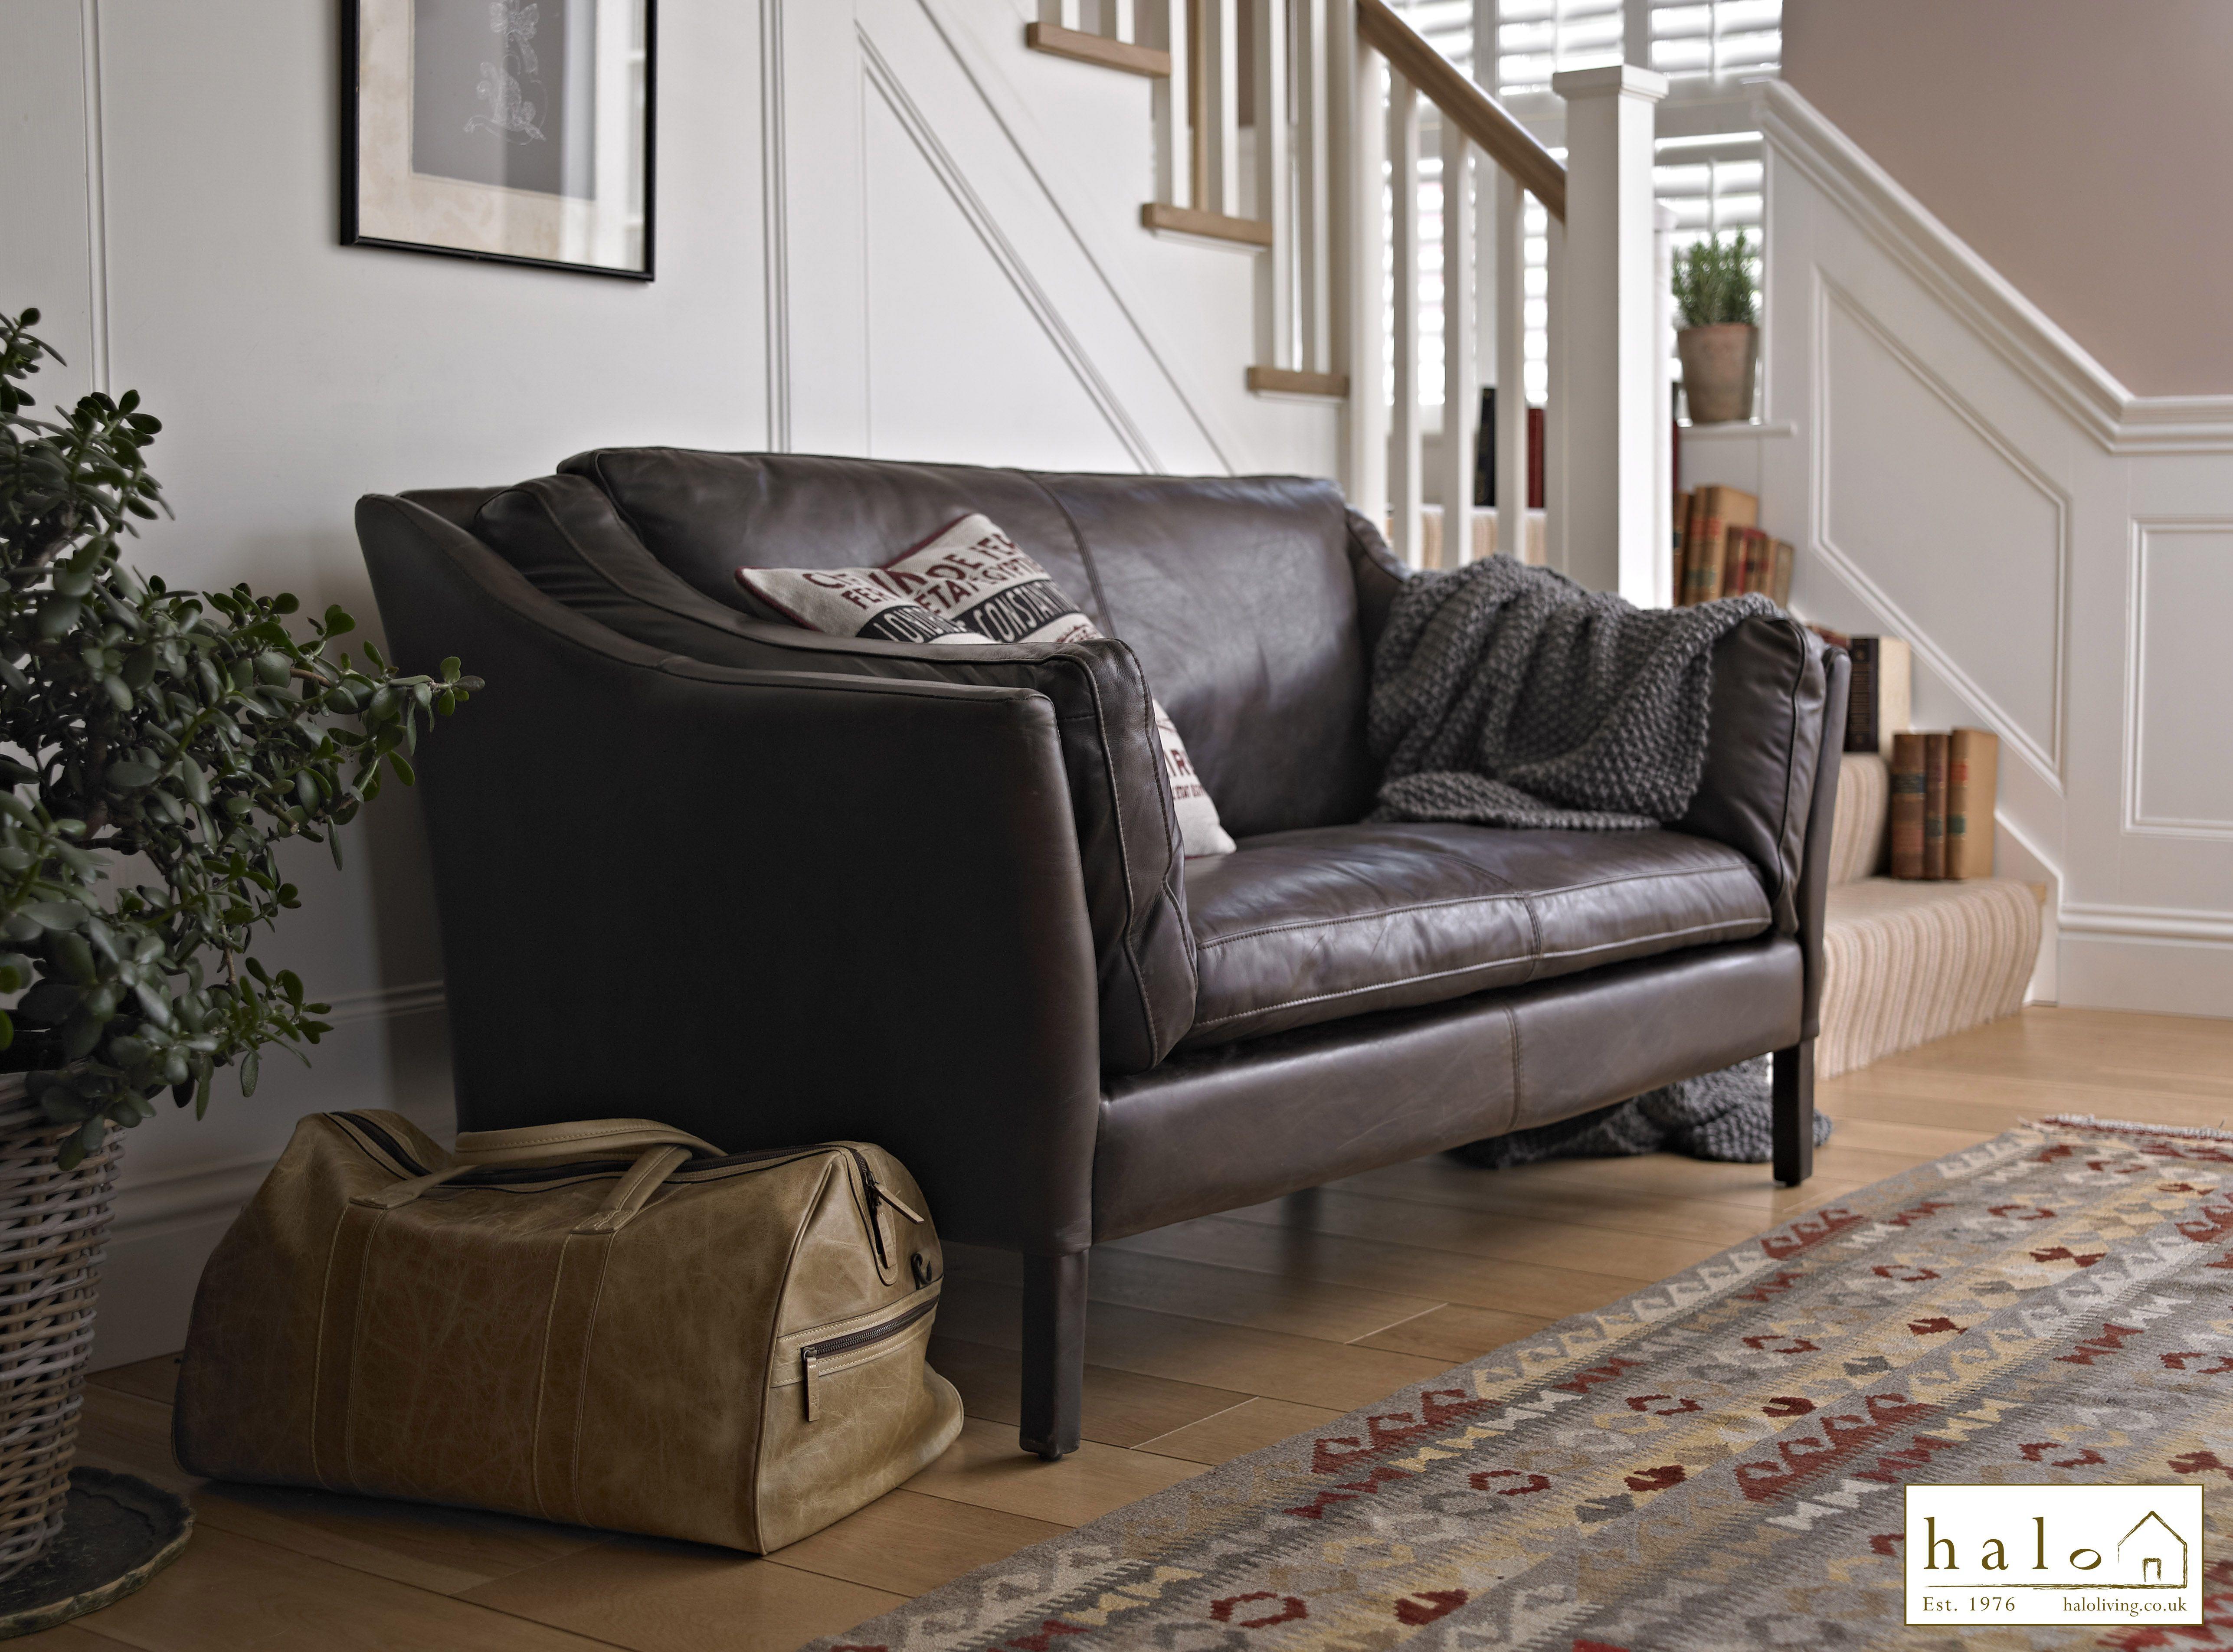 Halo Castro leather sofa HALO LIVING Pinterest